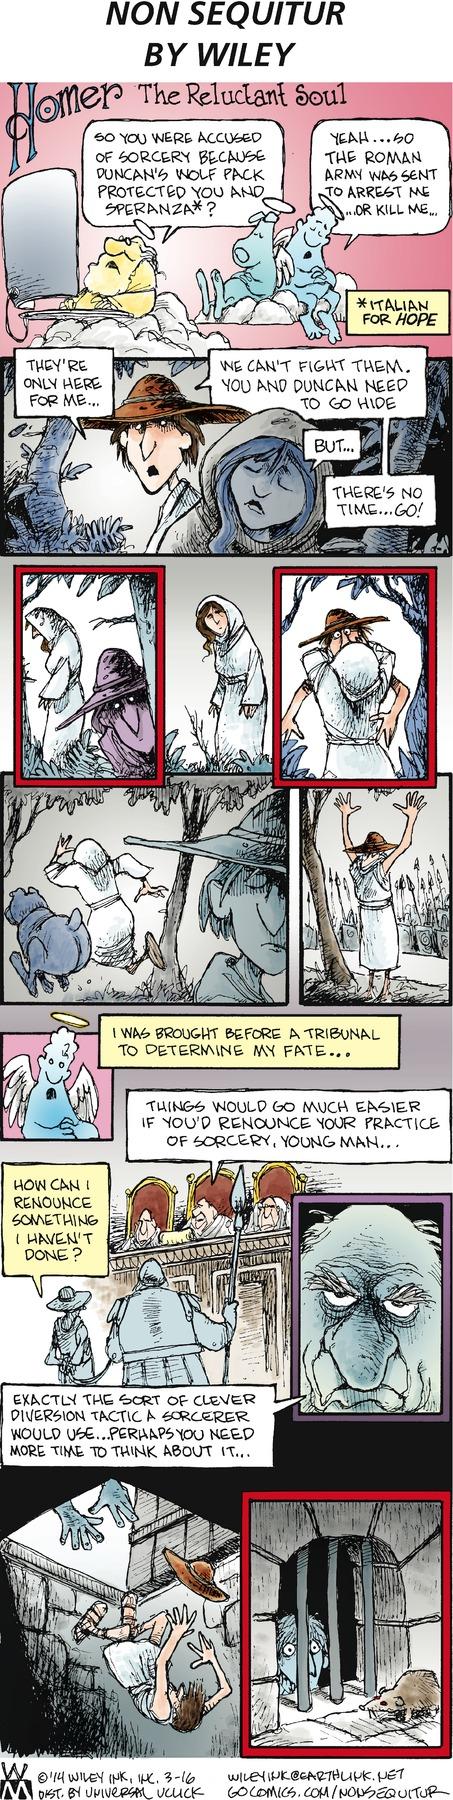 Non Sequitur for Mar 16, 2014 Comic Strip